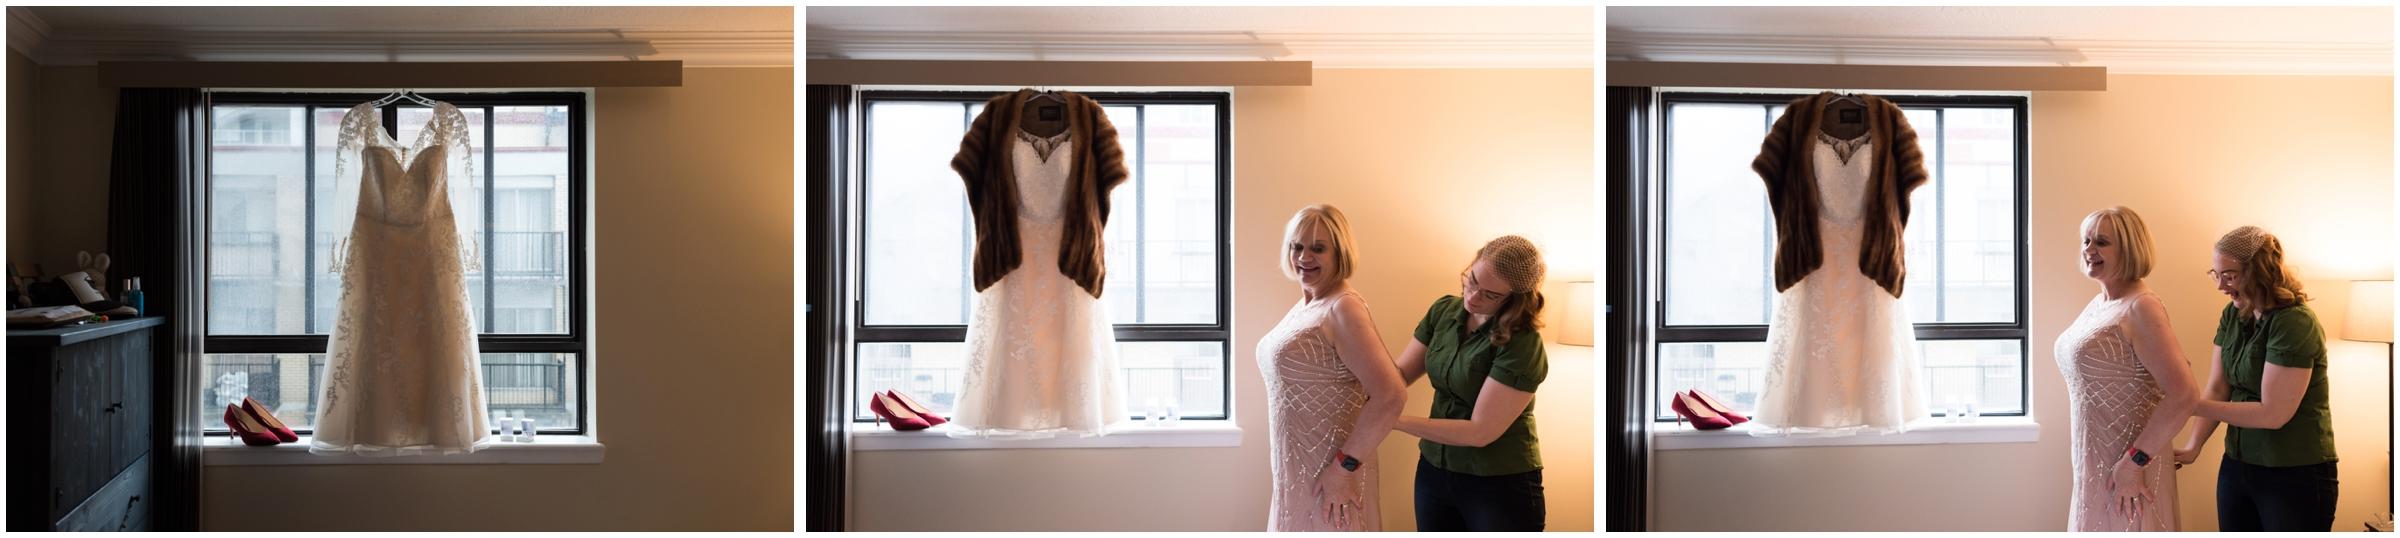 Ottaw Wedding Allison Andrew - (Selena Phillips-Boyle)_0014.jpg